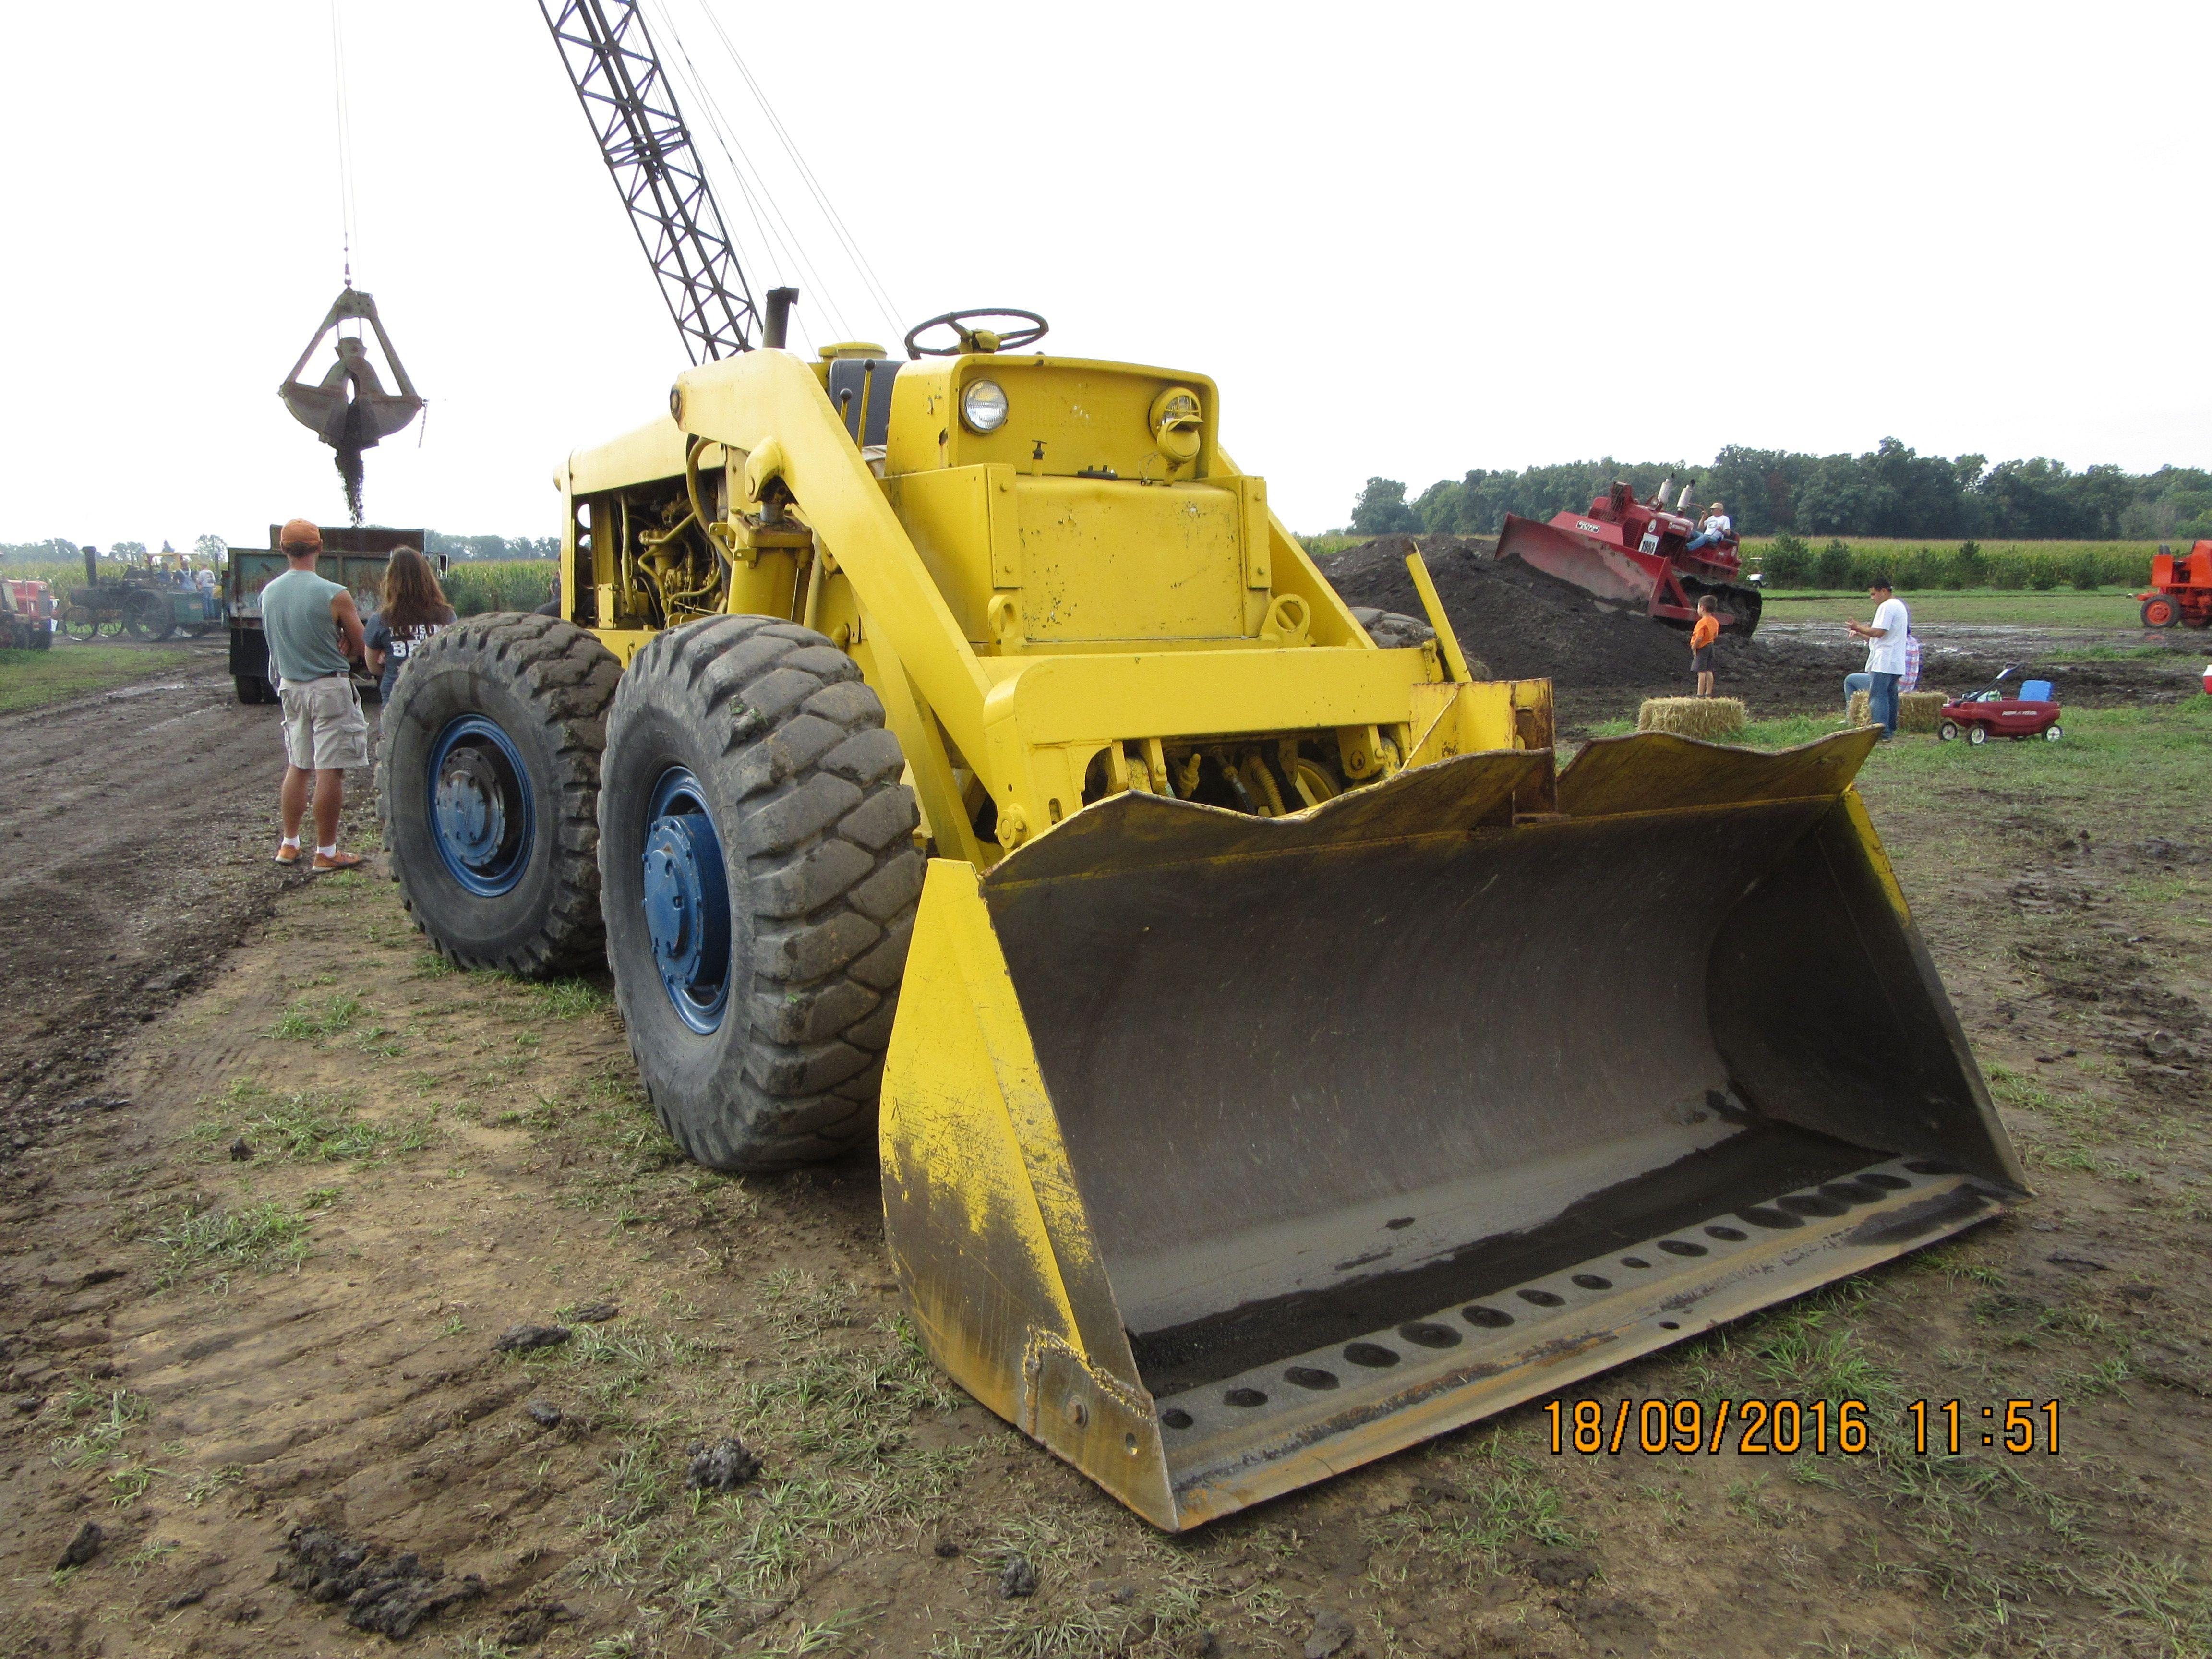 HCEA's Michigan 175A wheel loader Construction EquipMy